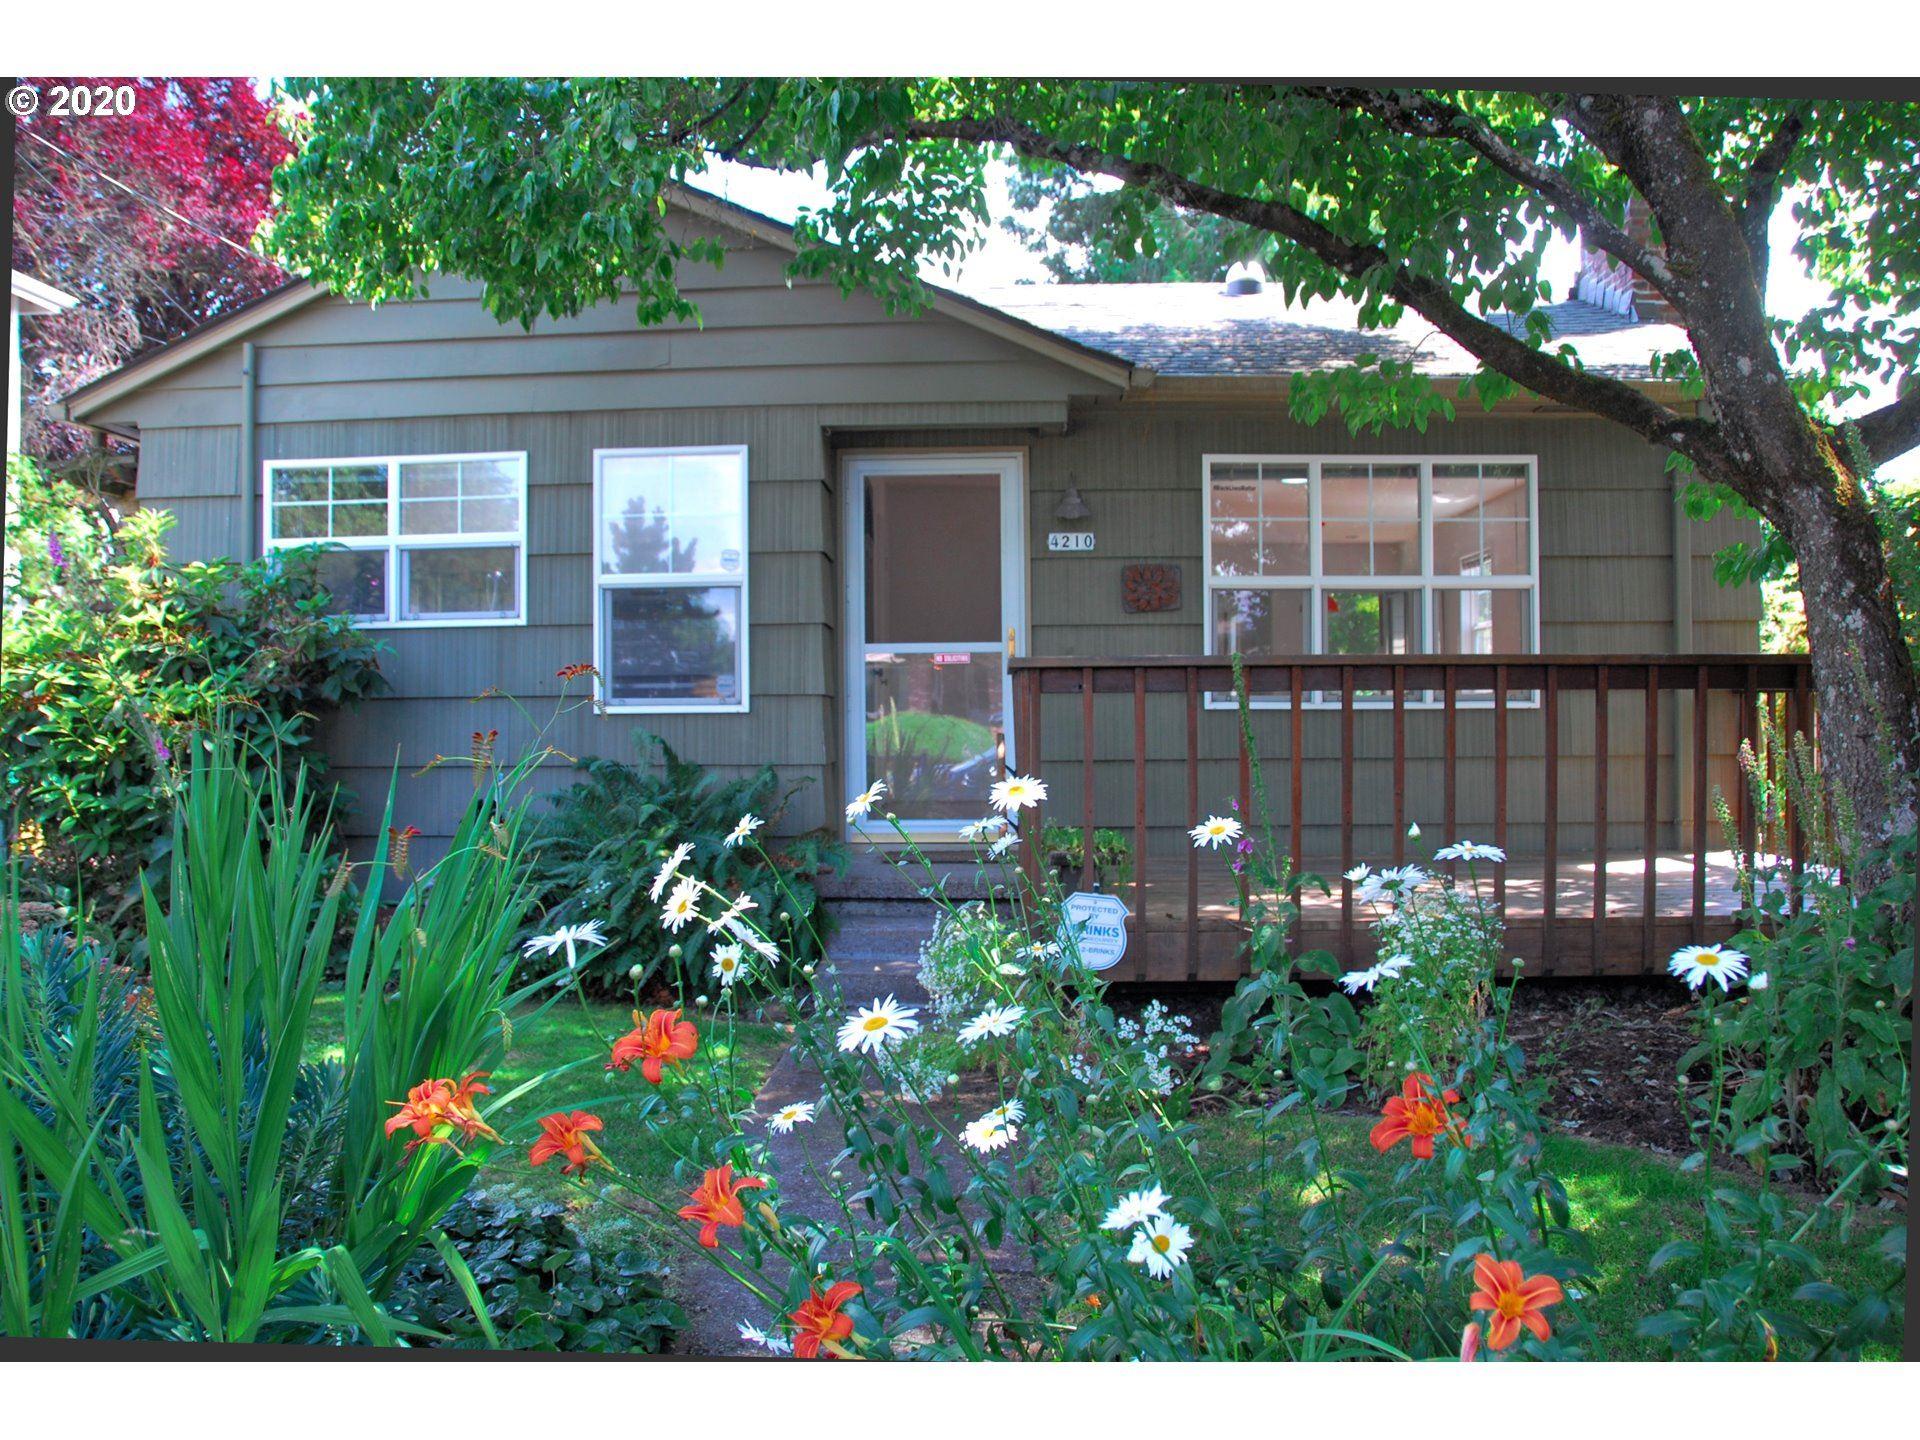 4210 SE BYBEE BLVD, Portland, OR 97206 - MLS#: 20455240